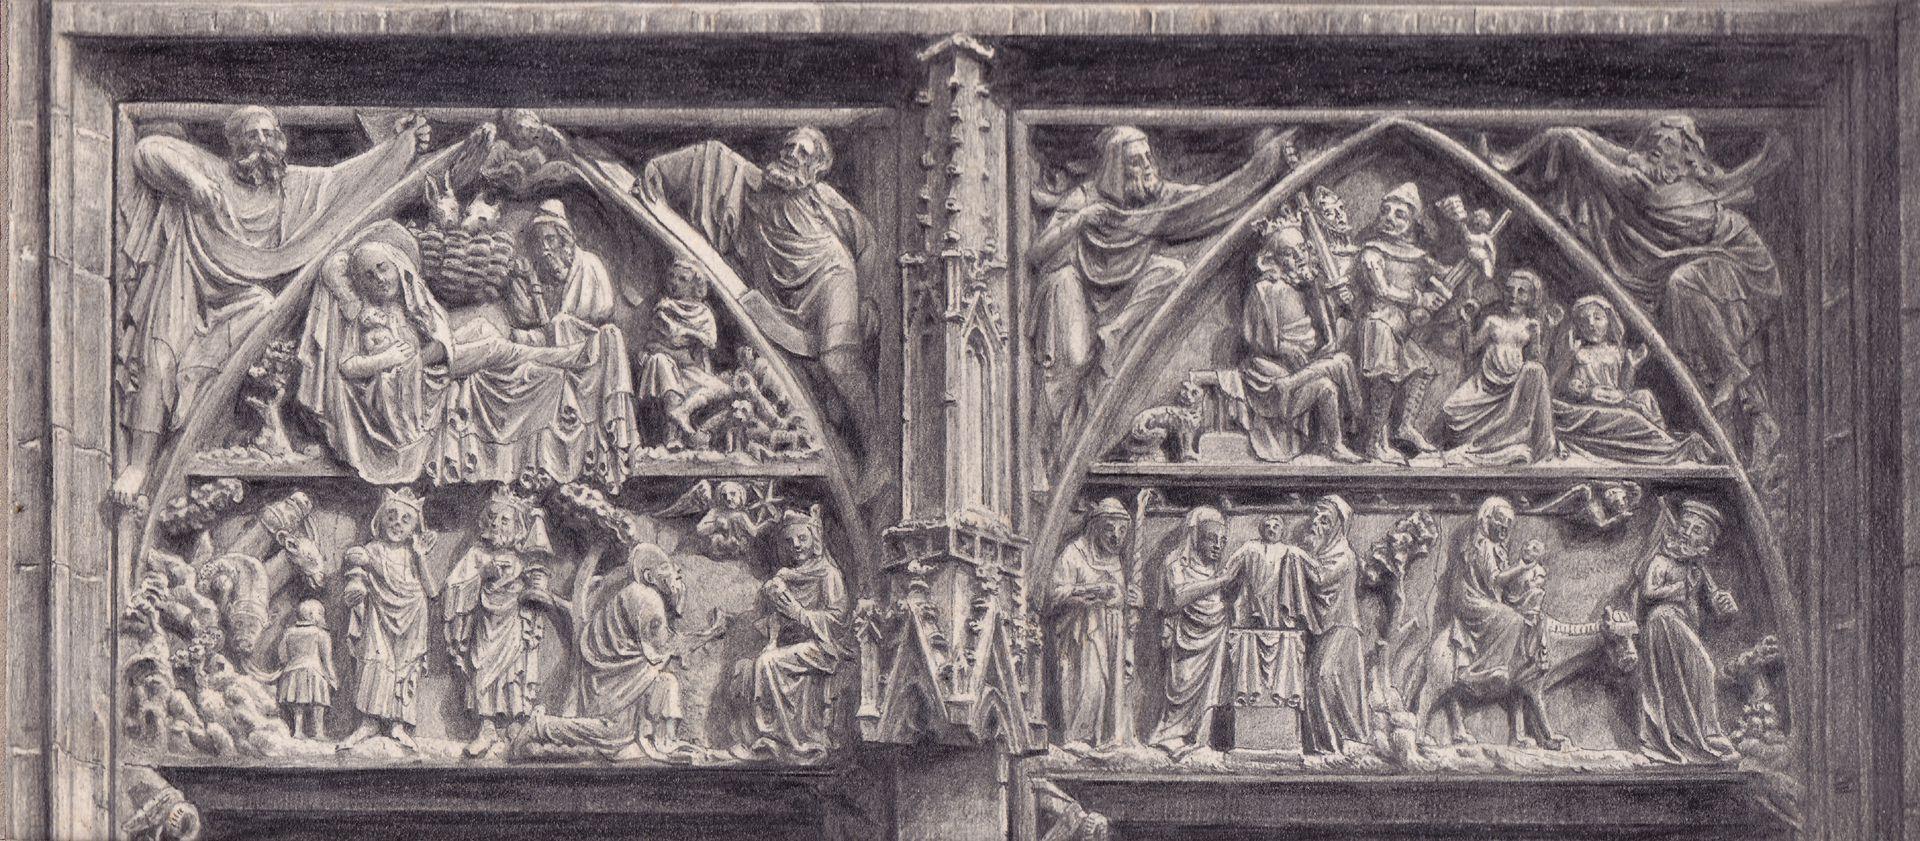 St. Lorenz, Tympanonregister des Hauptportals St. Lorenz, Tympanonregister des Hauptportals